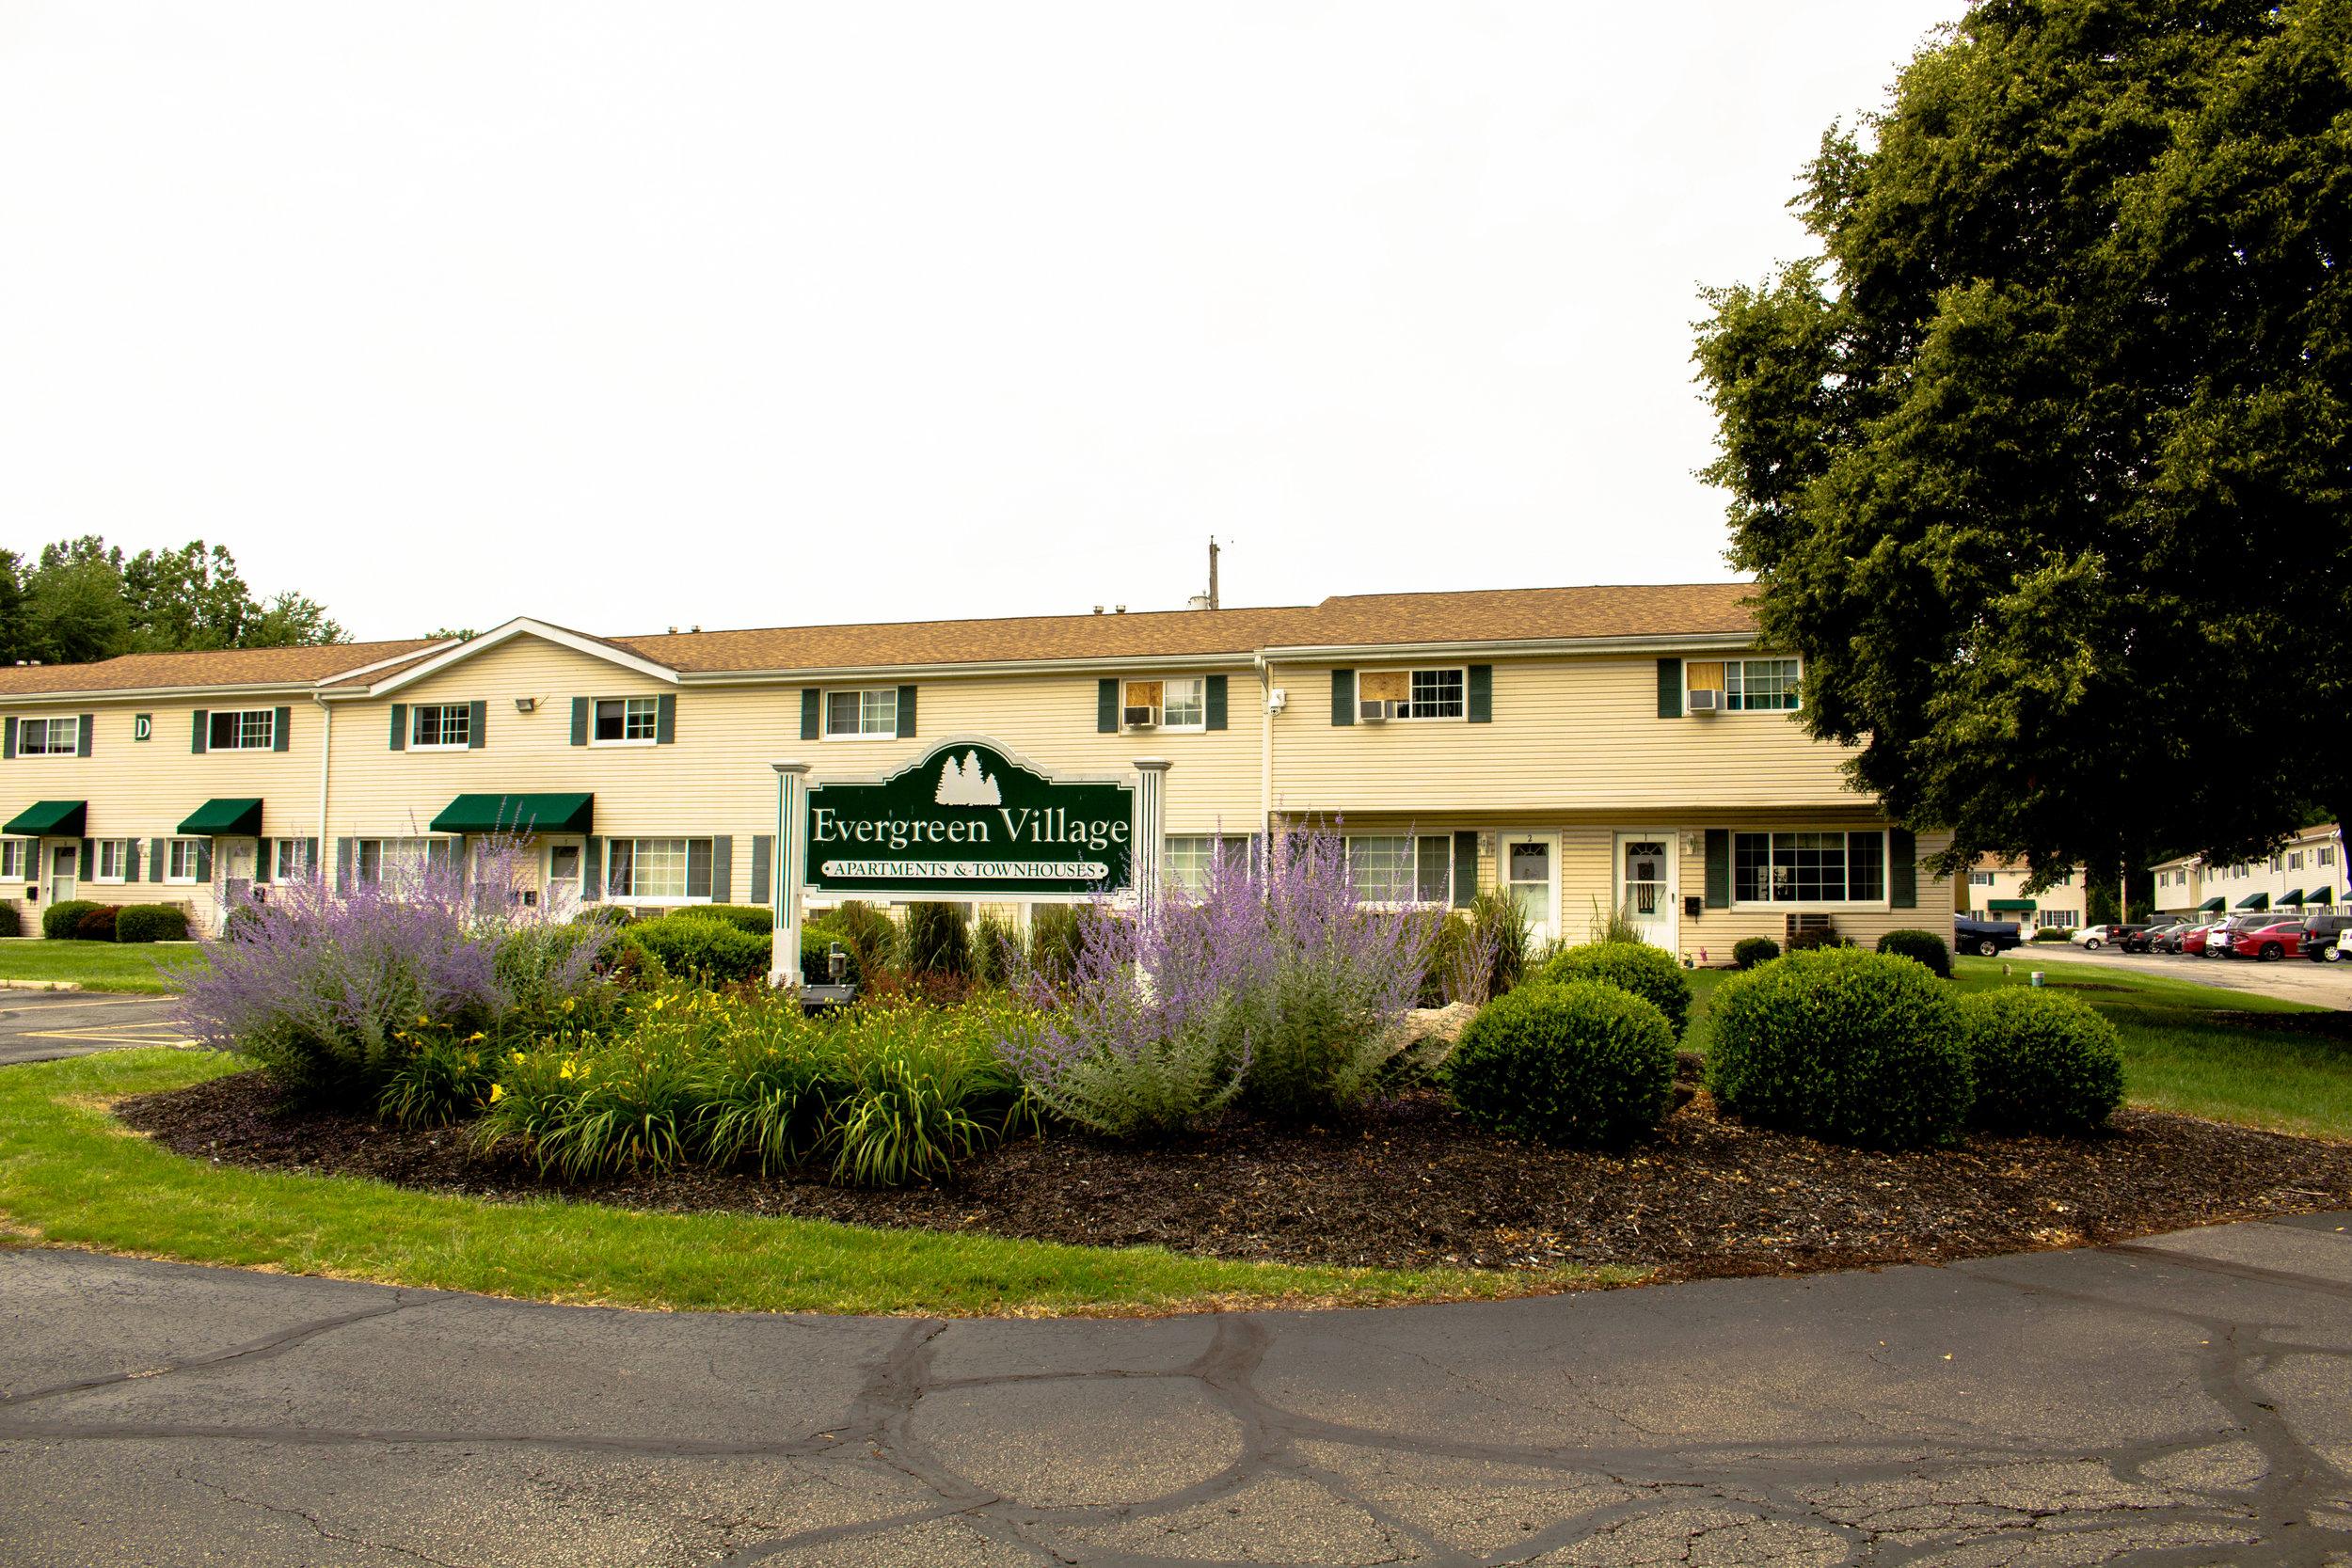 Evergreen Village Apartments - Elyria, Ohio